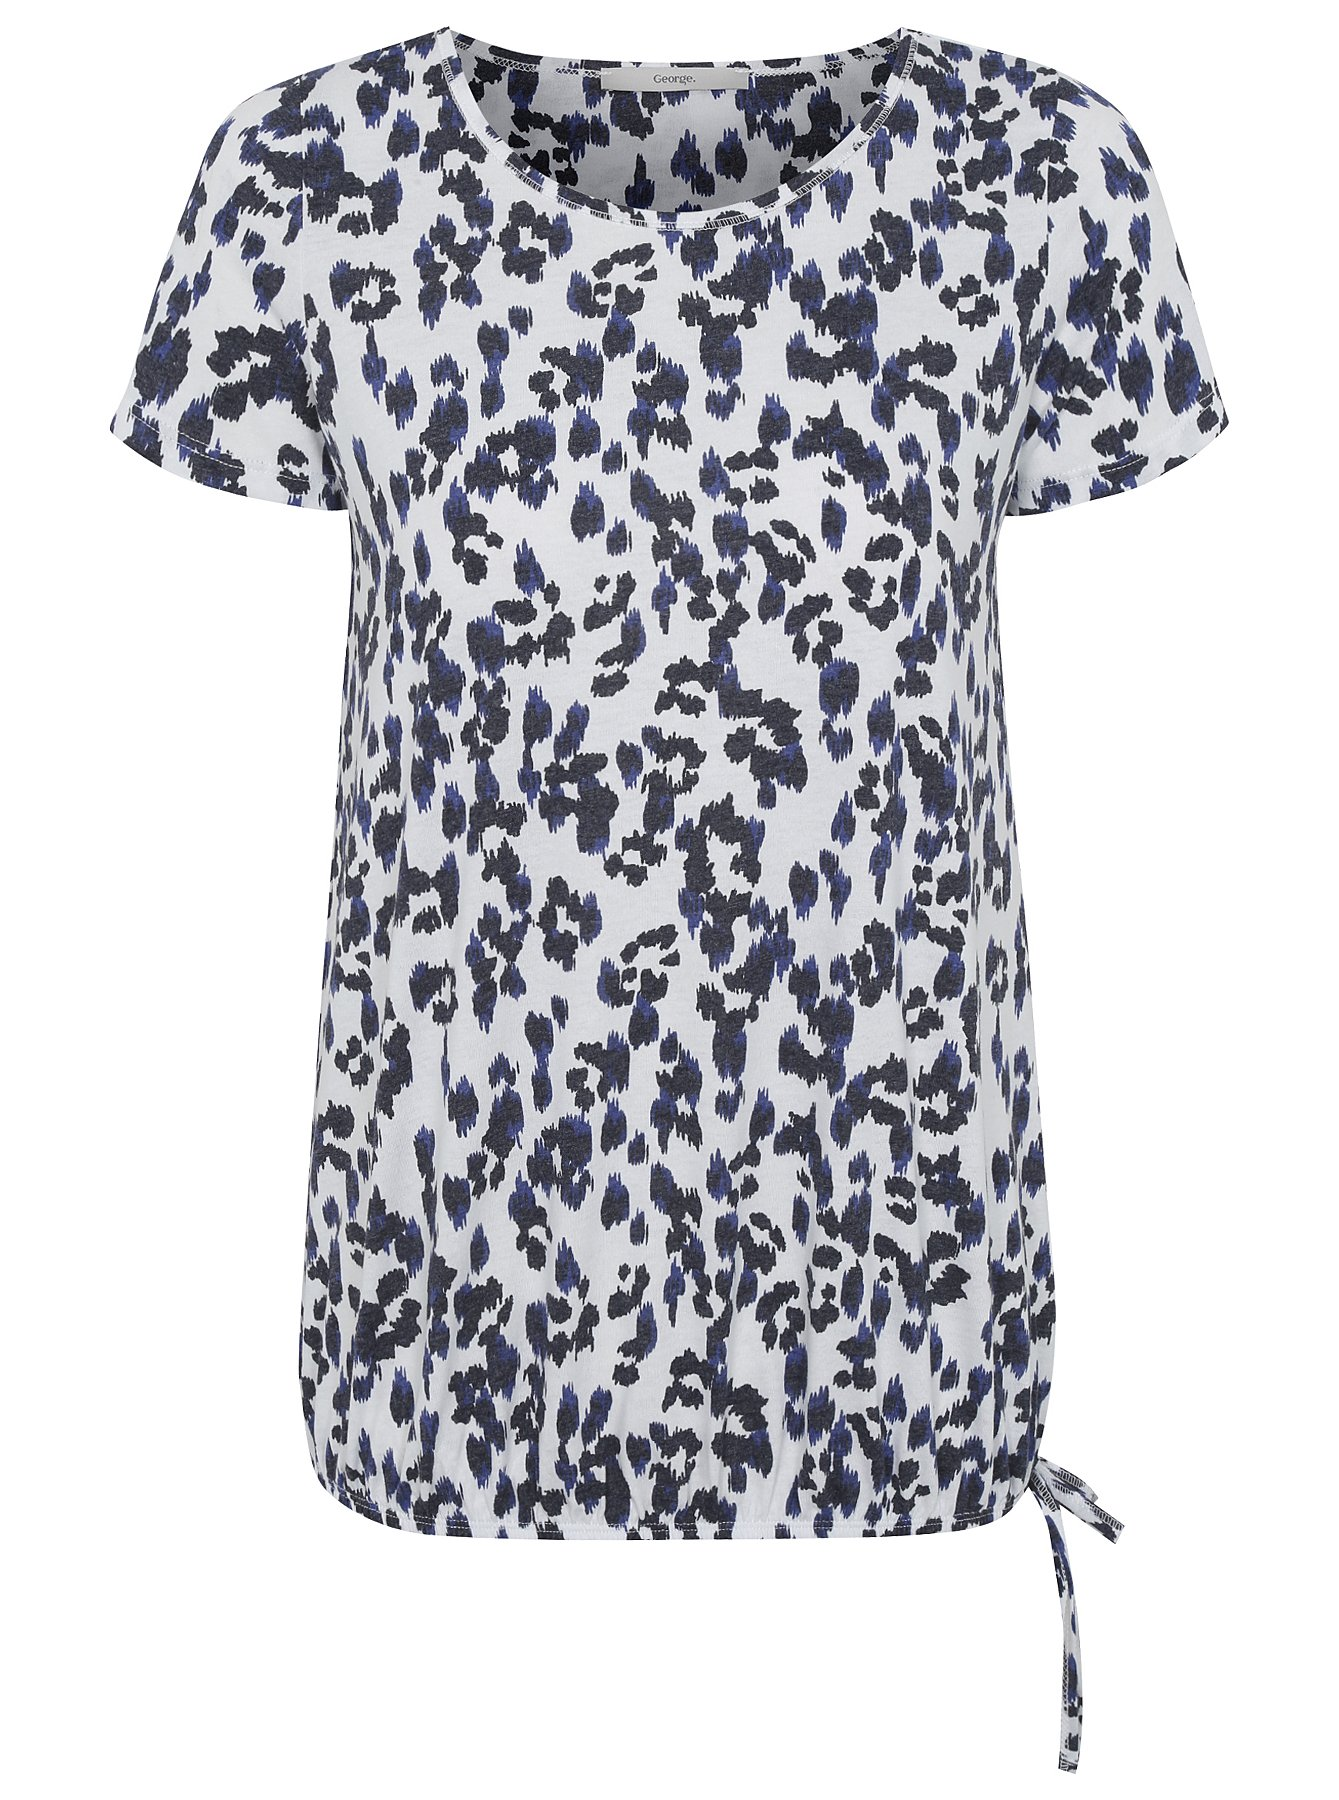 Leopard Print Bubble Hem Top | Women | George at ASDA